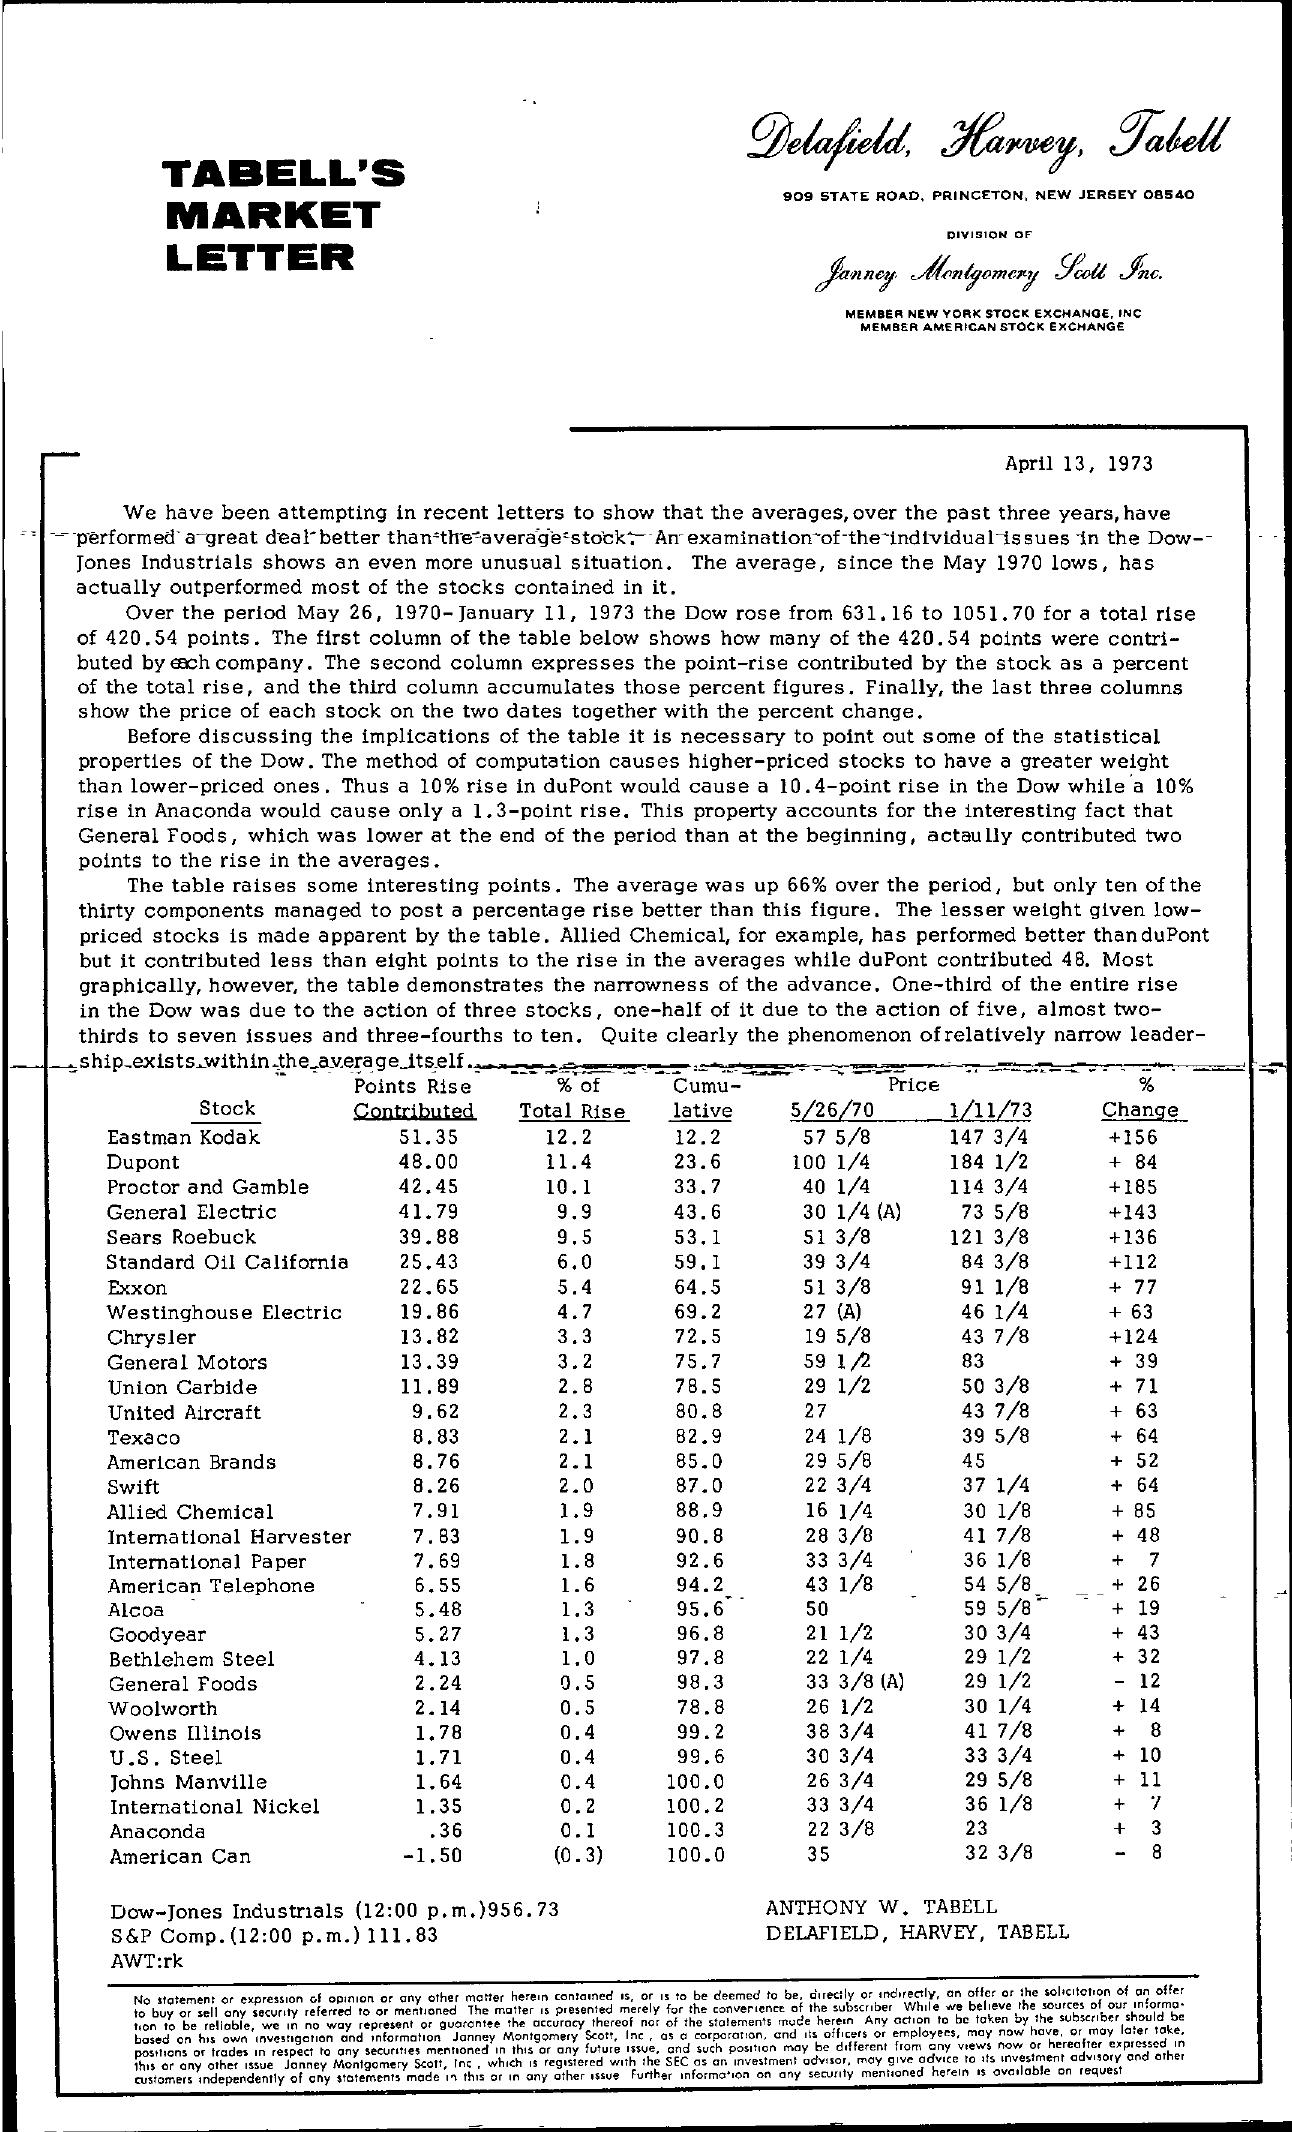 Tabell's Market Letter - April 13, 1973